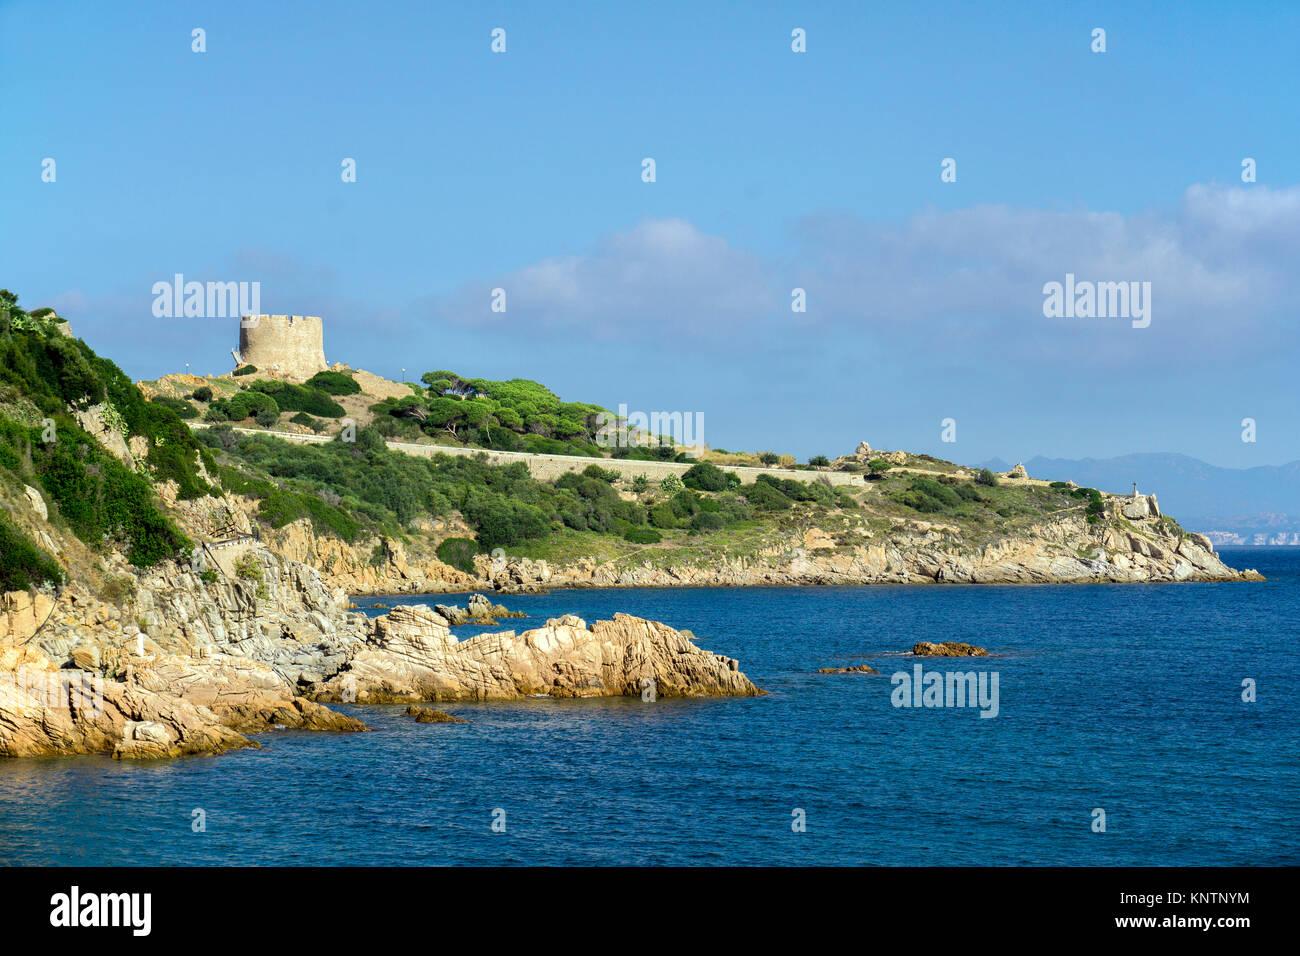 Torre di Longonsardo, Langosardo Turm an der Küste von Santa Teresa di Gallura, Sardinien, Italien, Mittelmeer, Stockbild